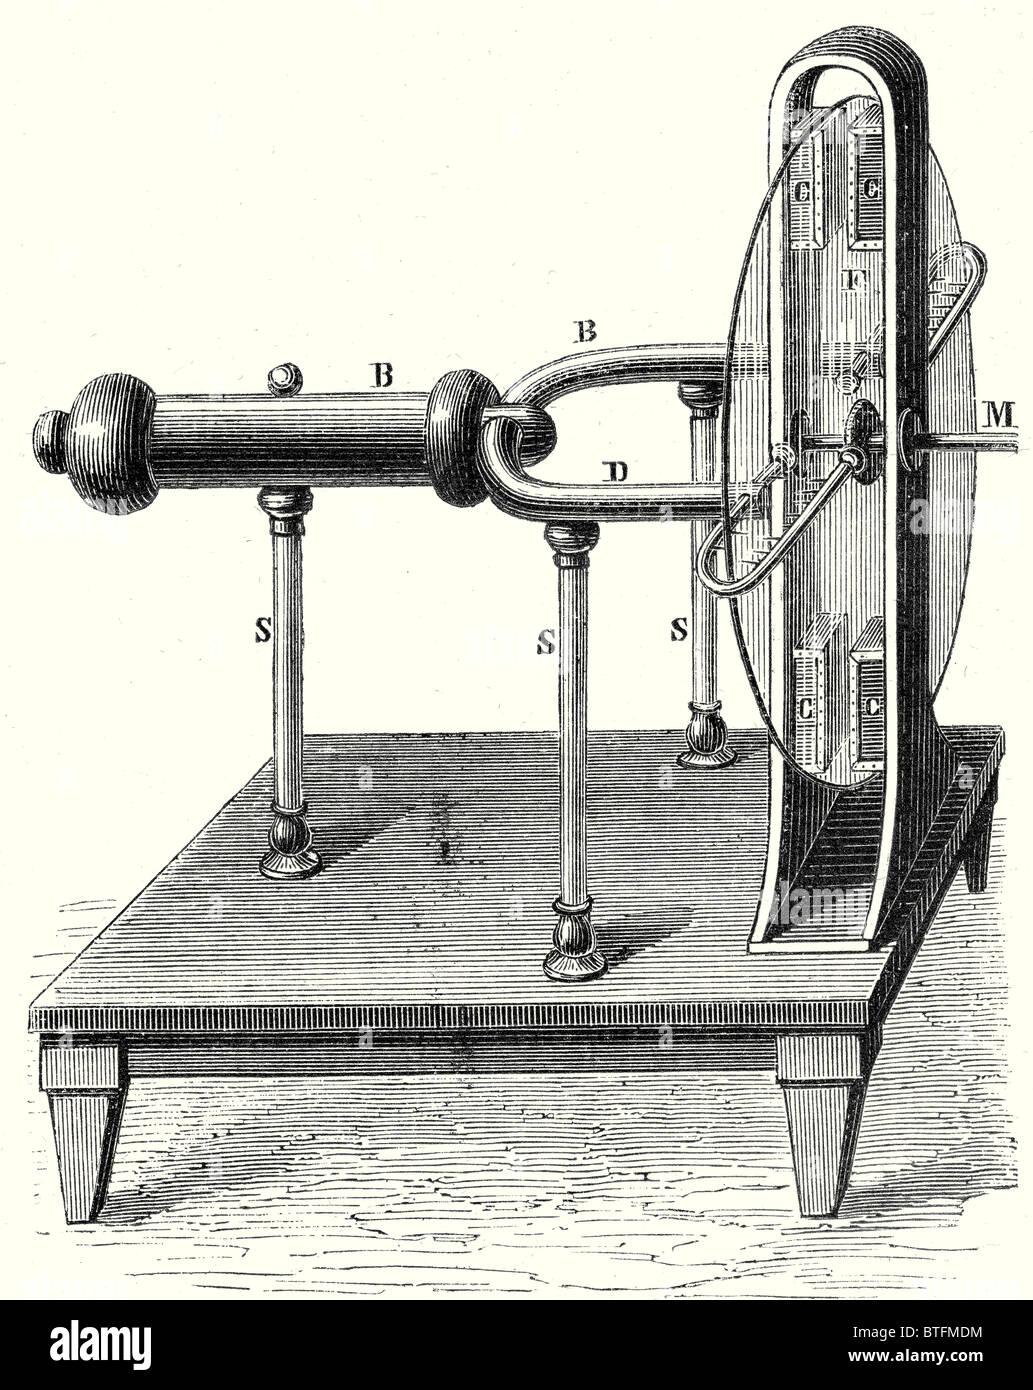 Ramsden's electric machine (1768) - Stock Image